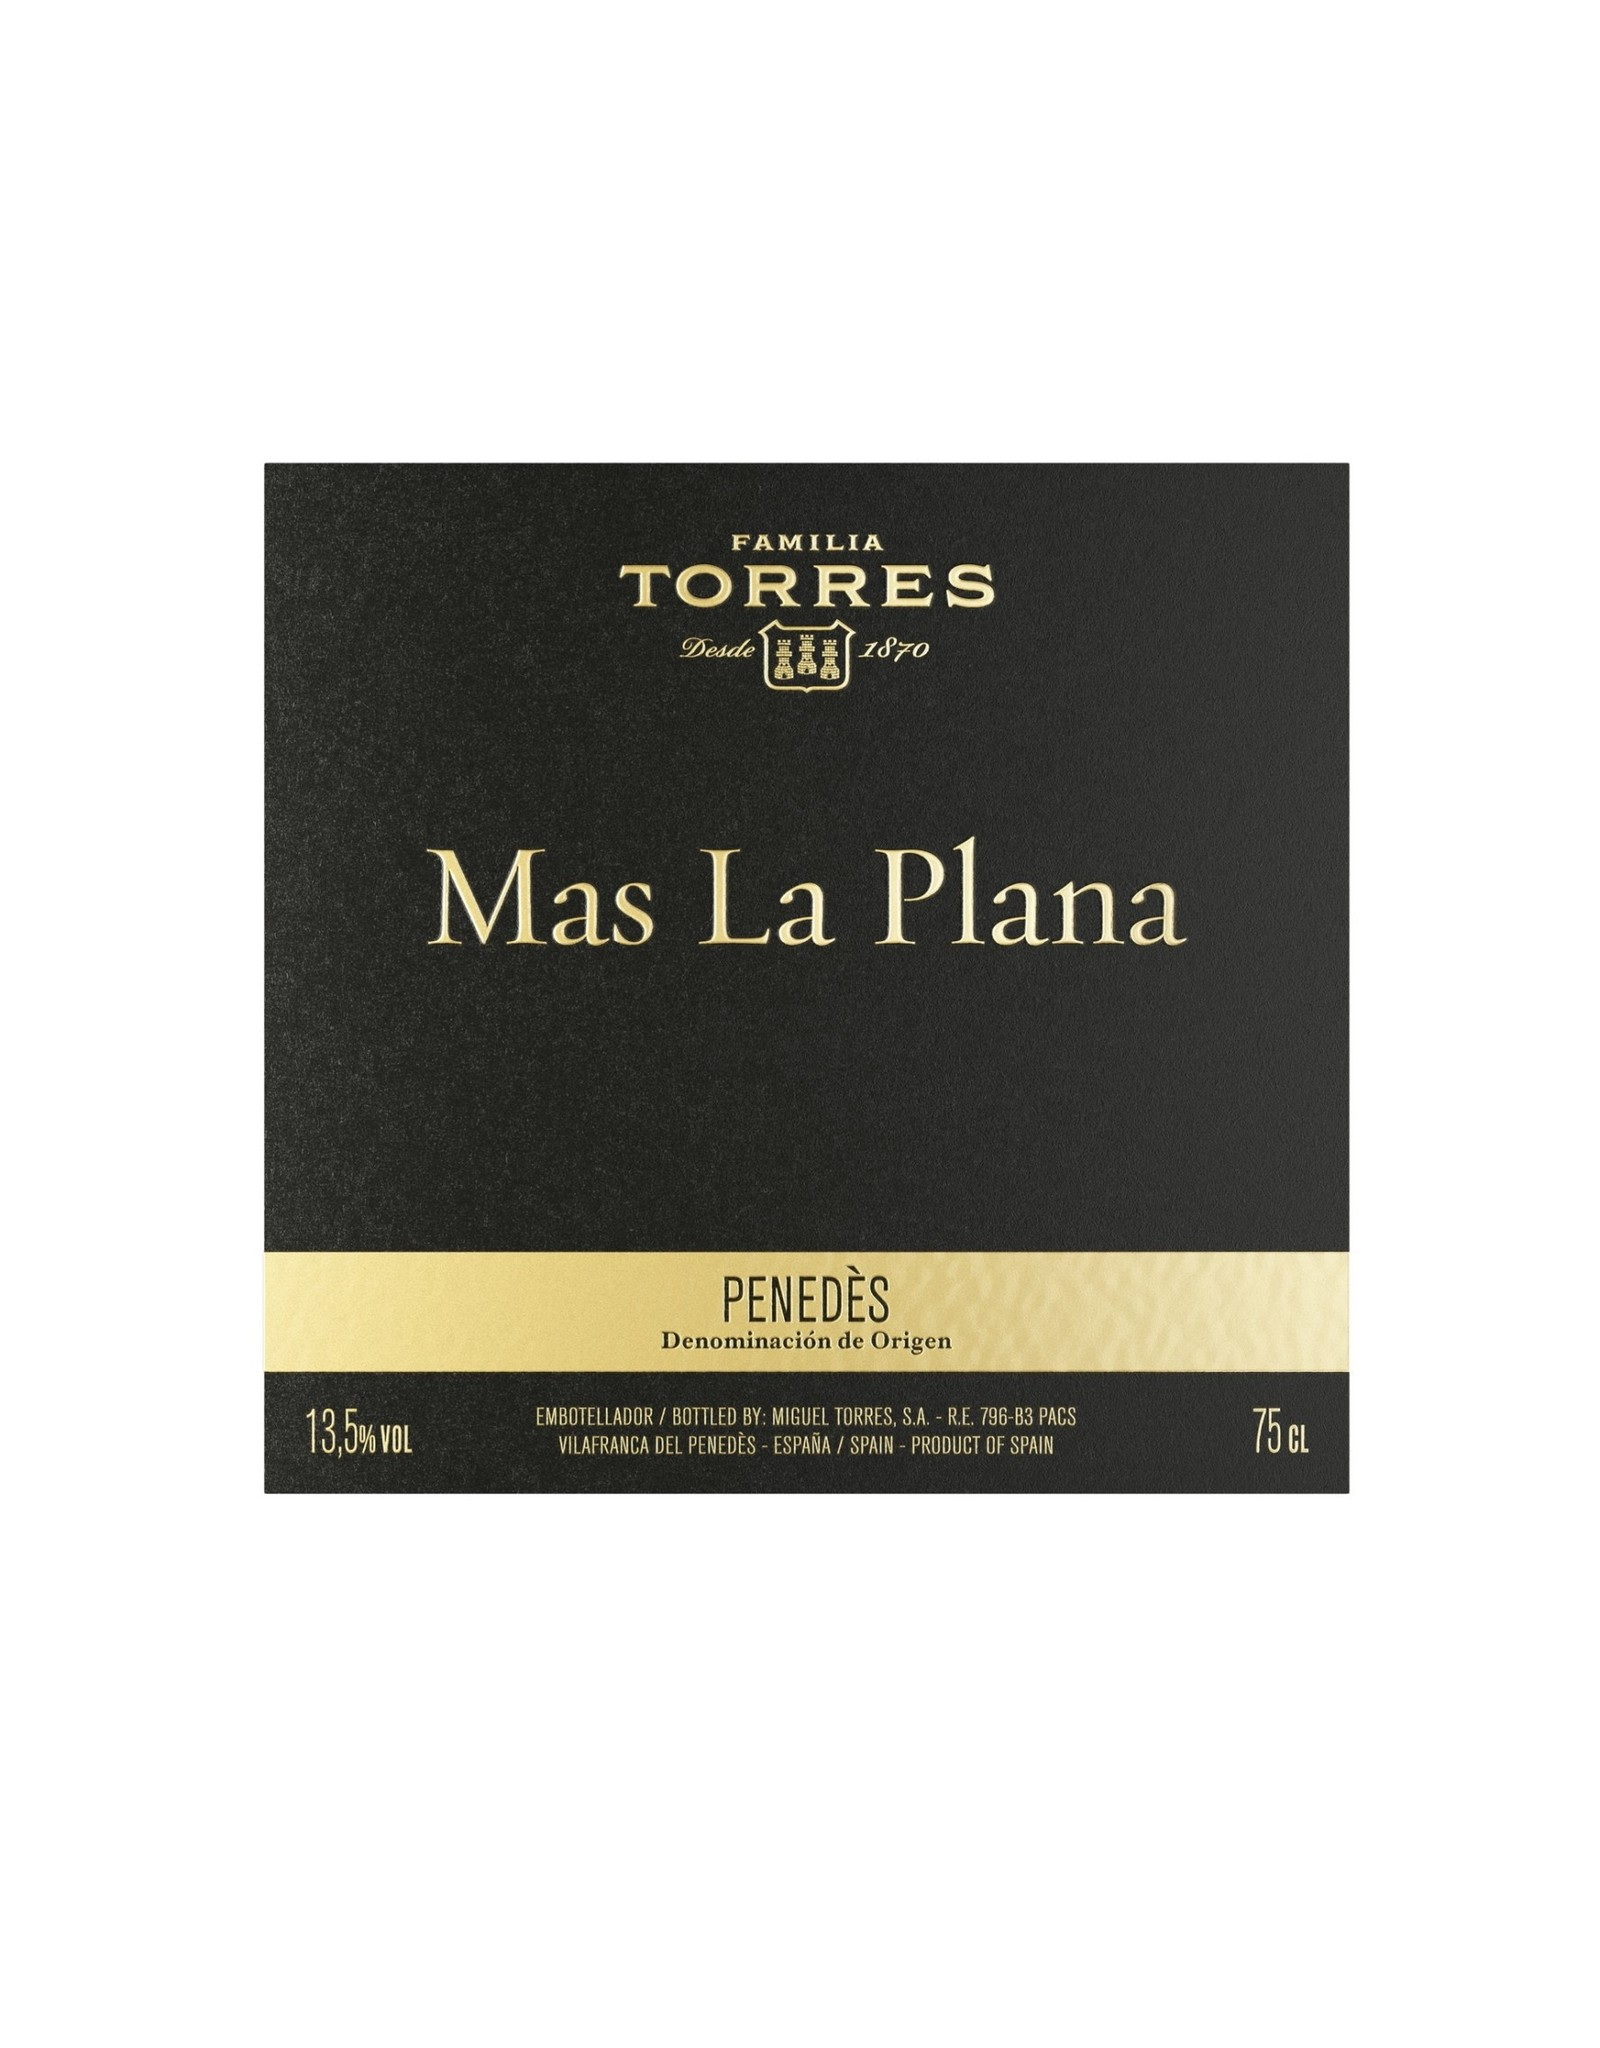 Torres Torres Mas La Plana Cabernet Sauvignon, Penedès 2016